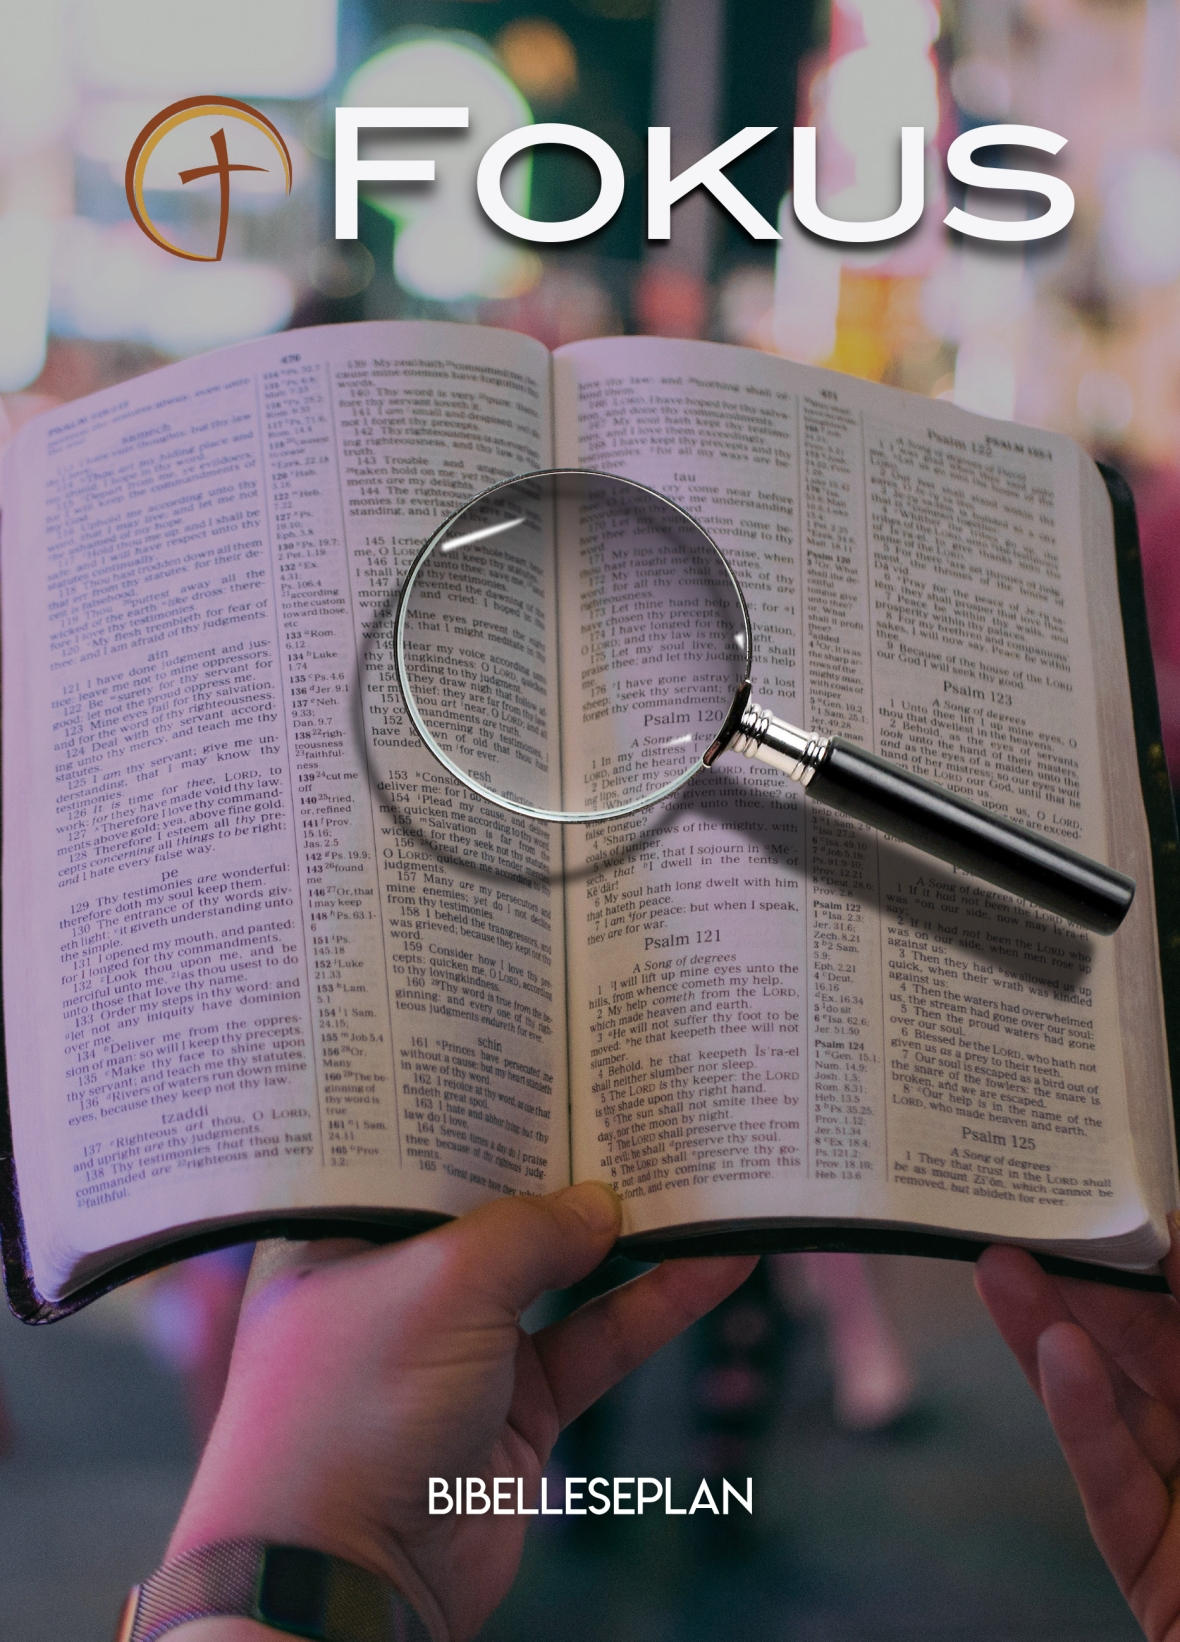 Bibelleseplan 2018 Pfingstgemeinde Augsburg